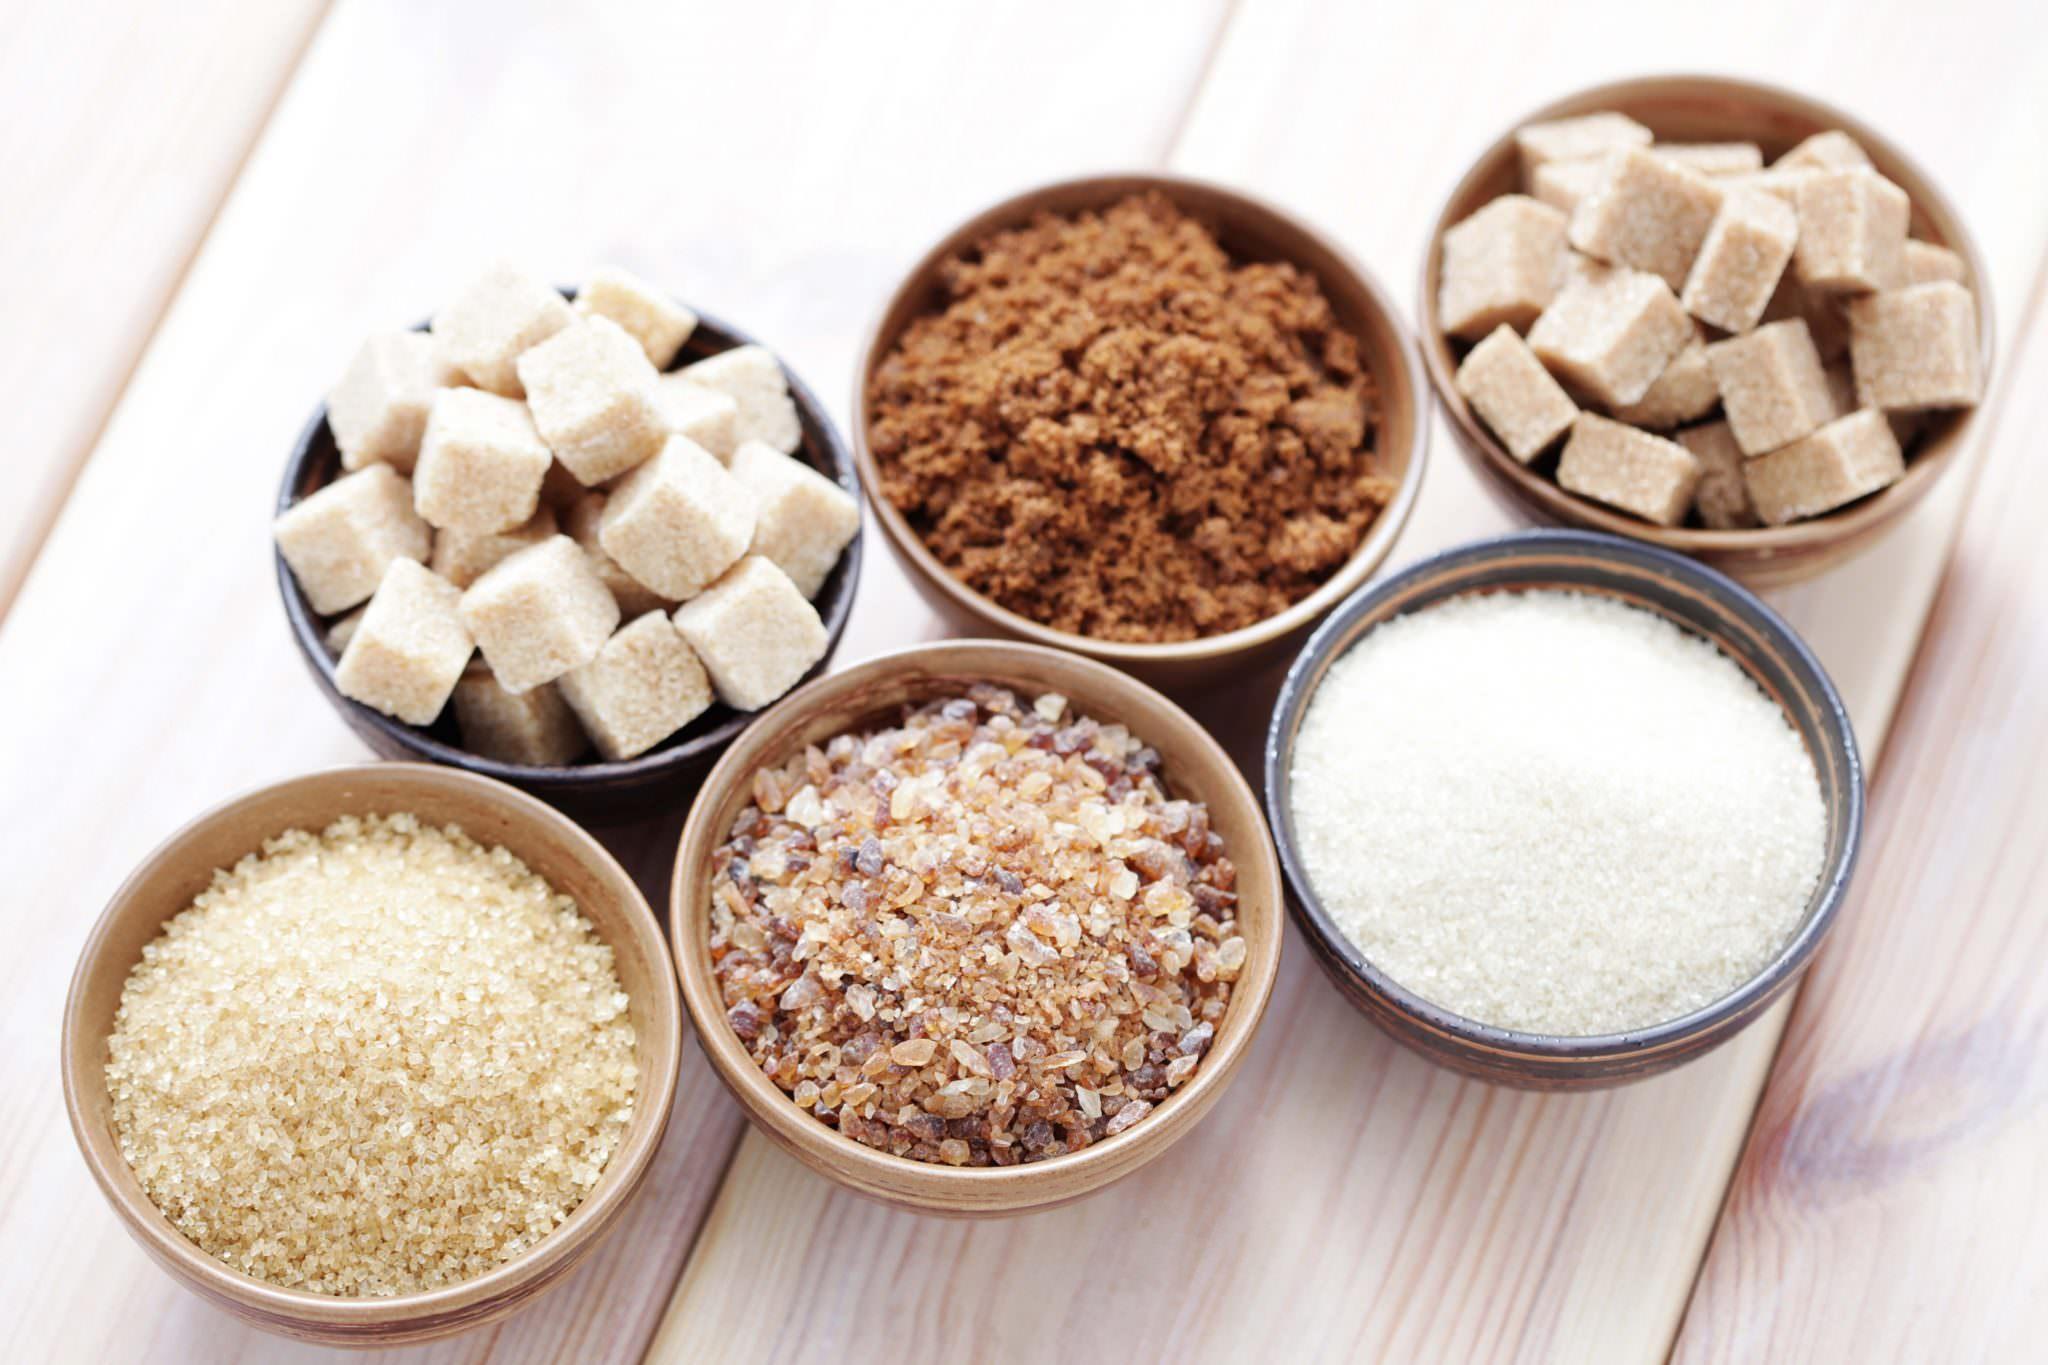 review muscle milk nutrition ingredients artificial sweetener mydietgoal hd